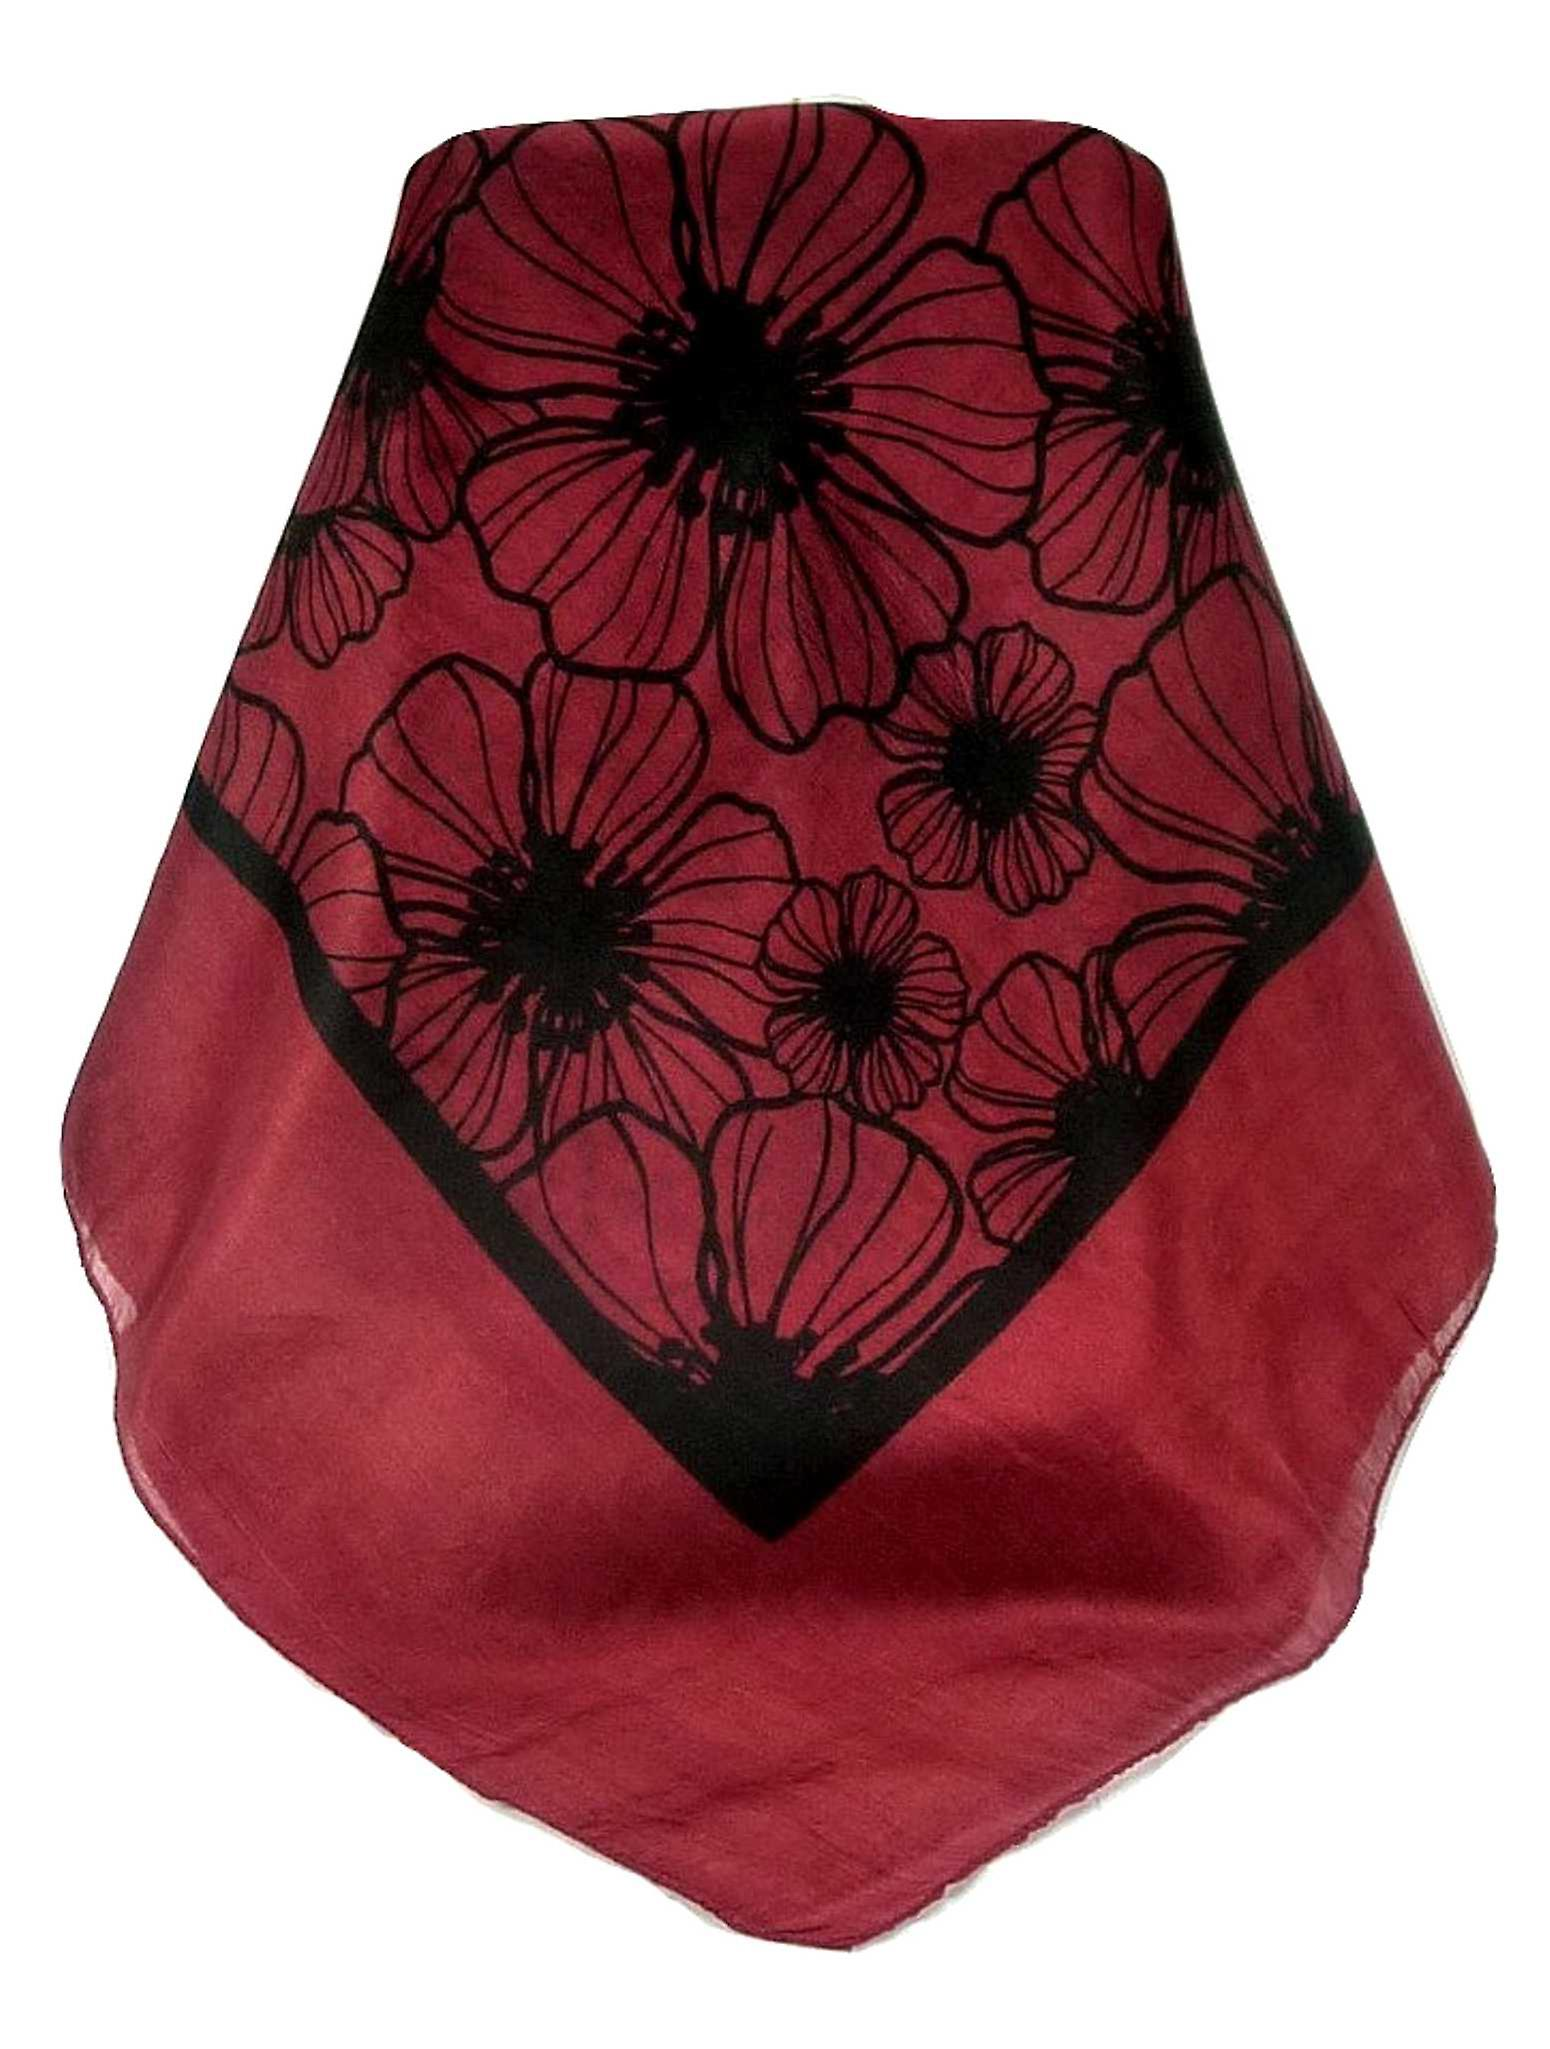 Mulberry Silk Contemporary Square Scarf Tora Carnation by Pashmina & Silk